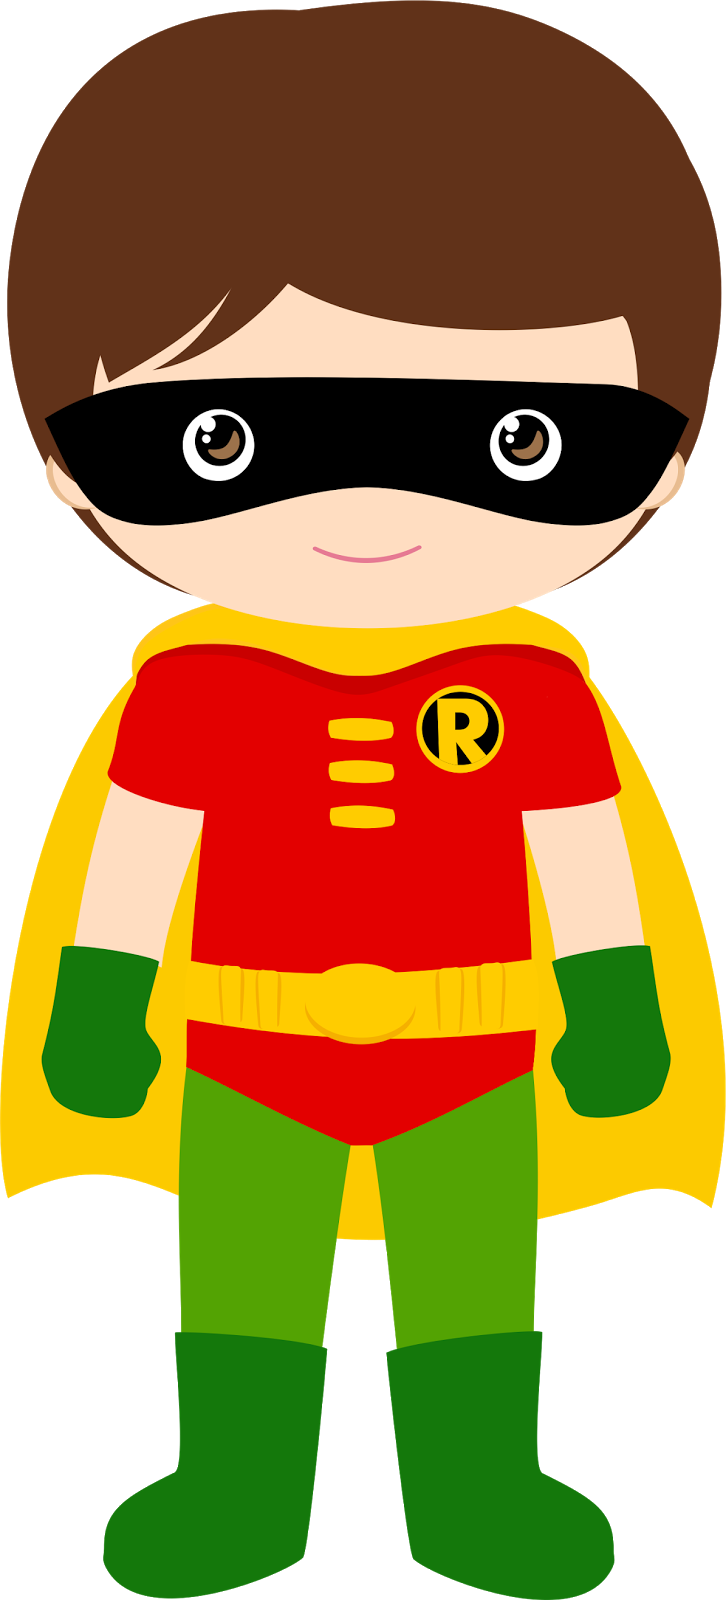 726x1600 Characters Of Batman Kids Version Clip Art. Super Hero